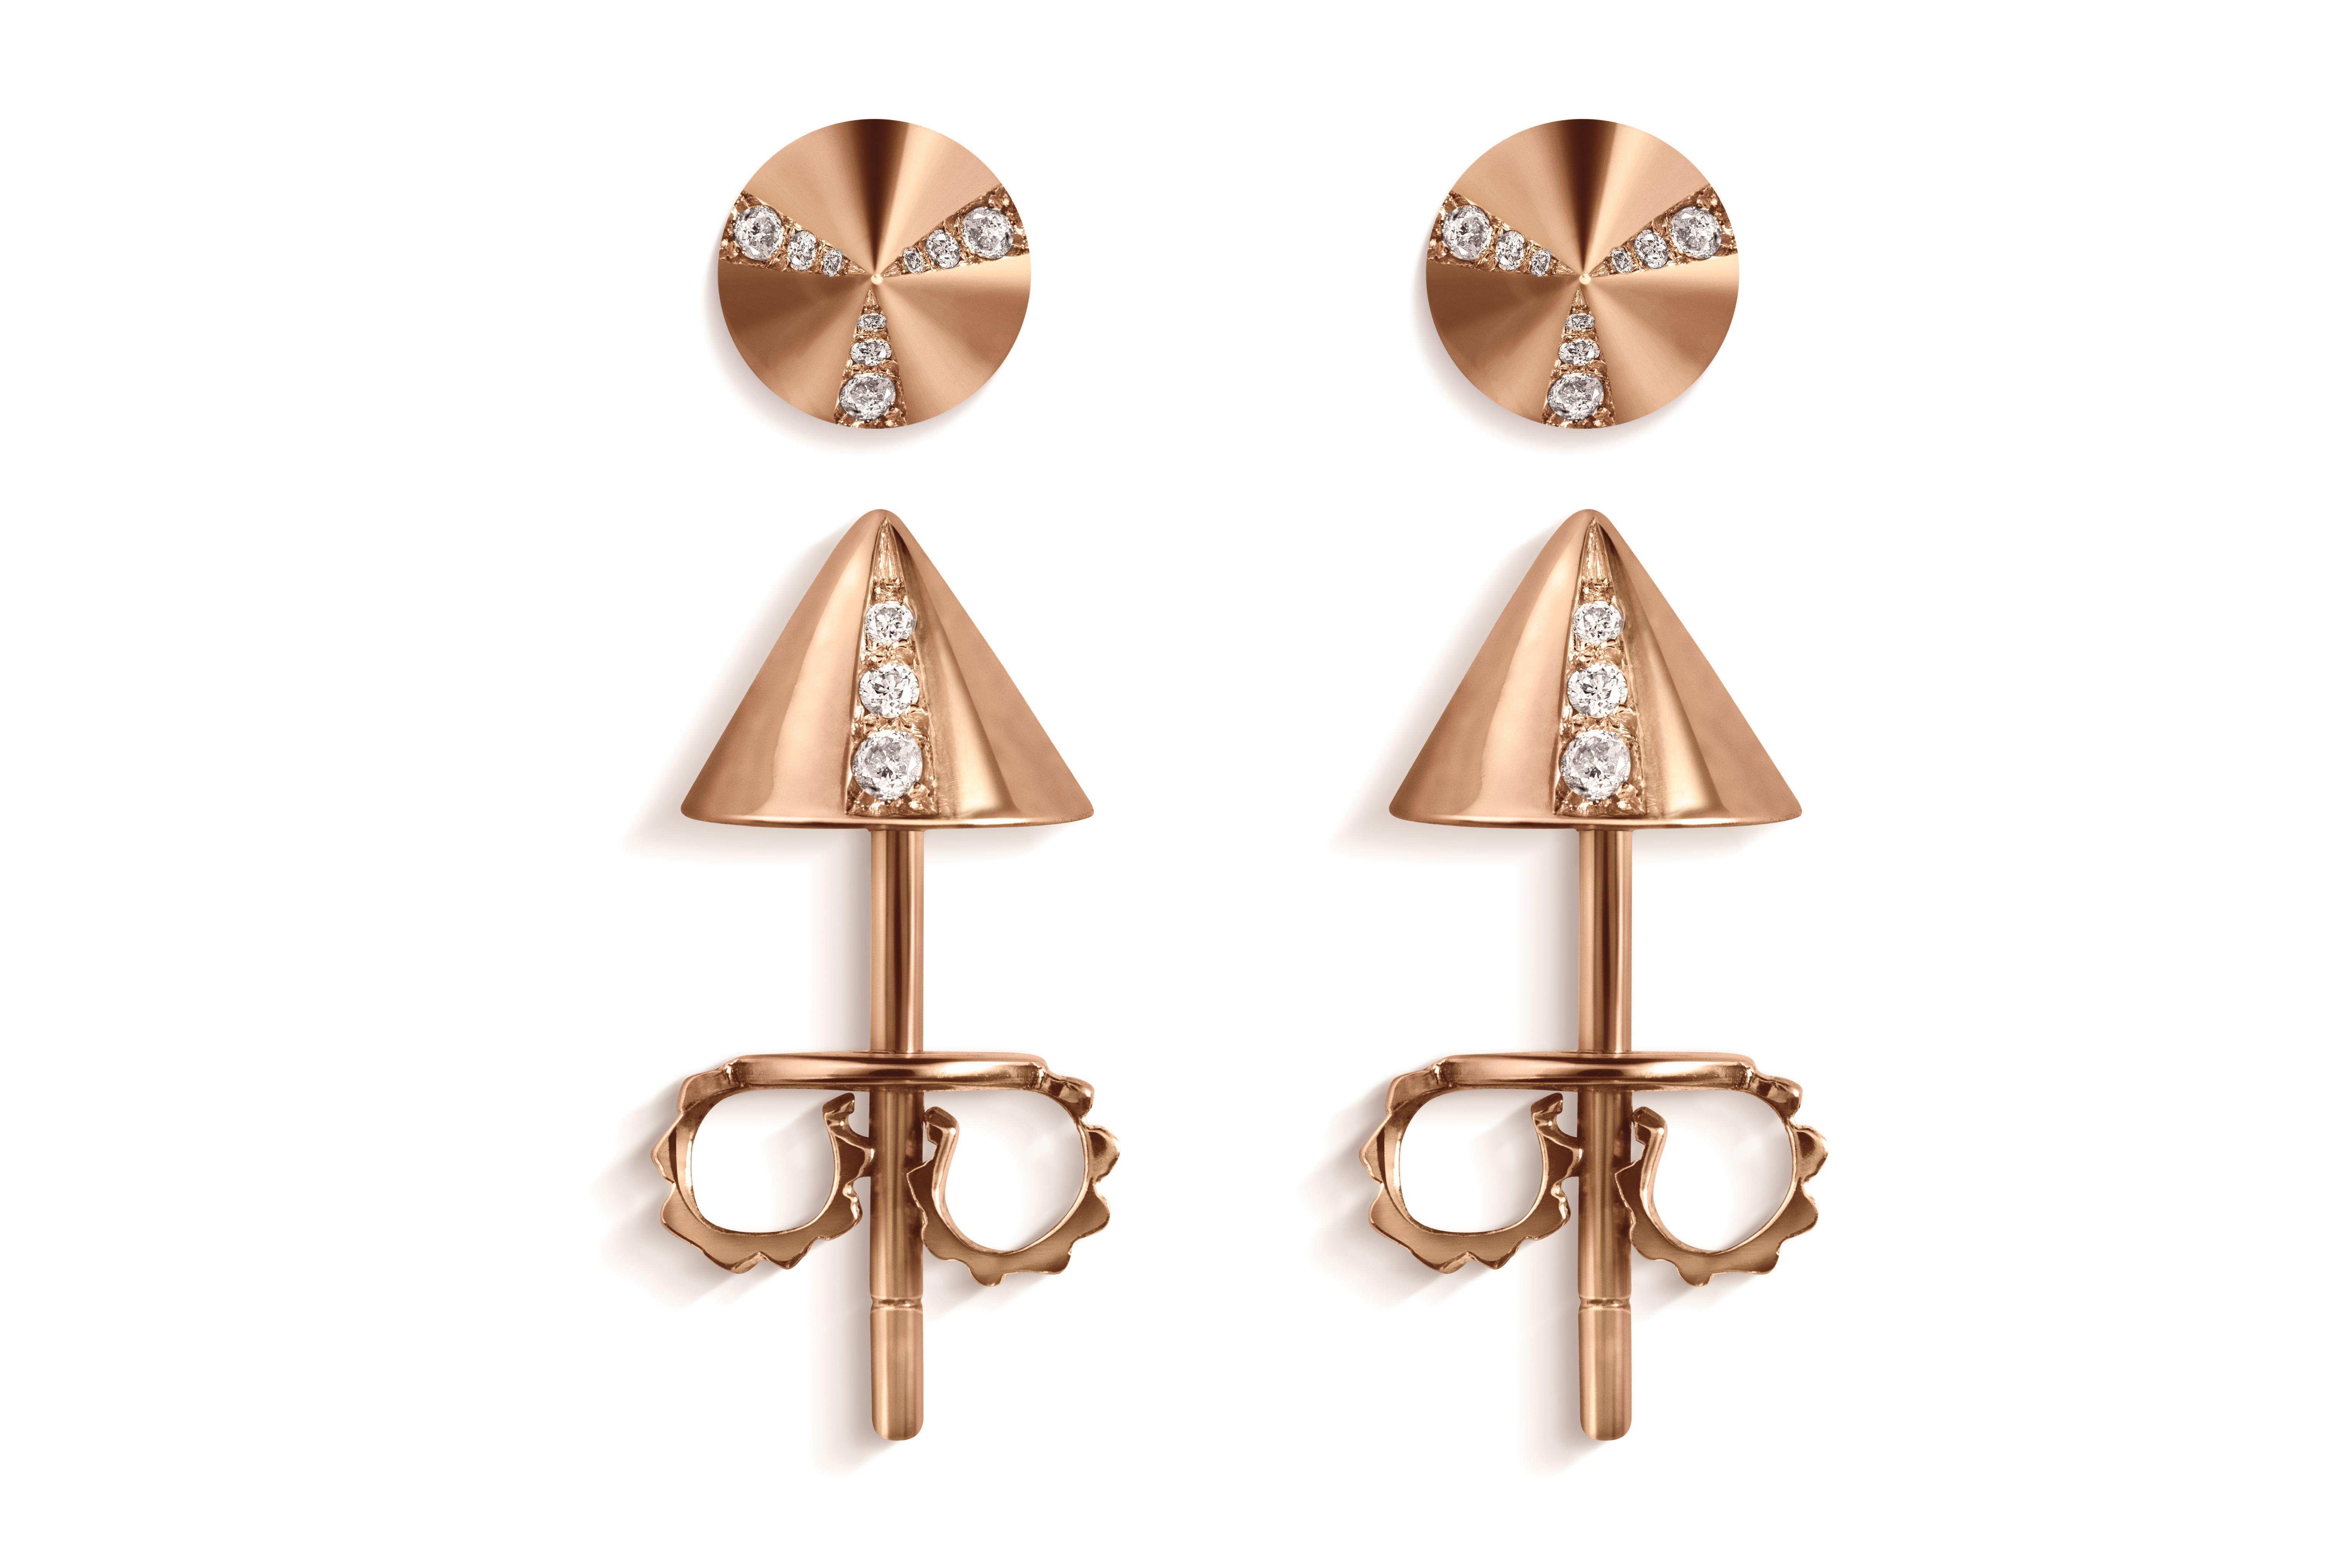 Spike Earrings in 18K Rose Gold with Diamonds.